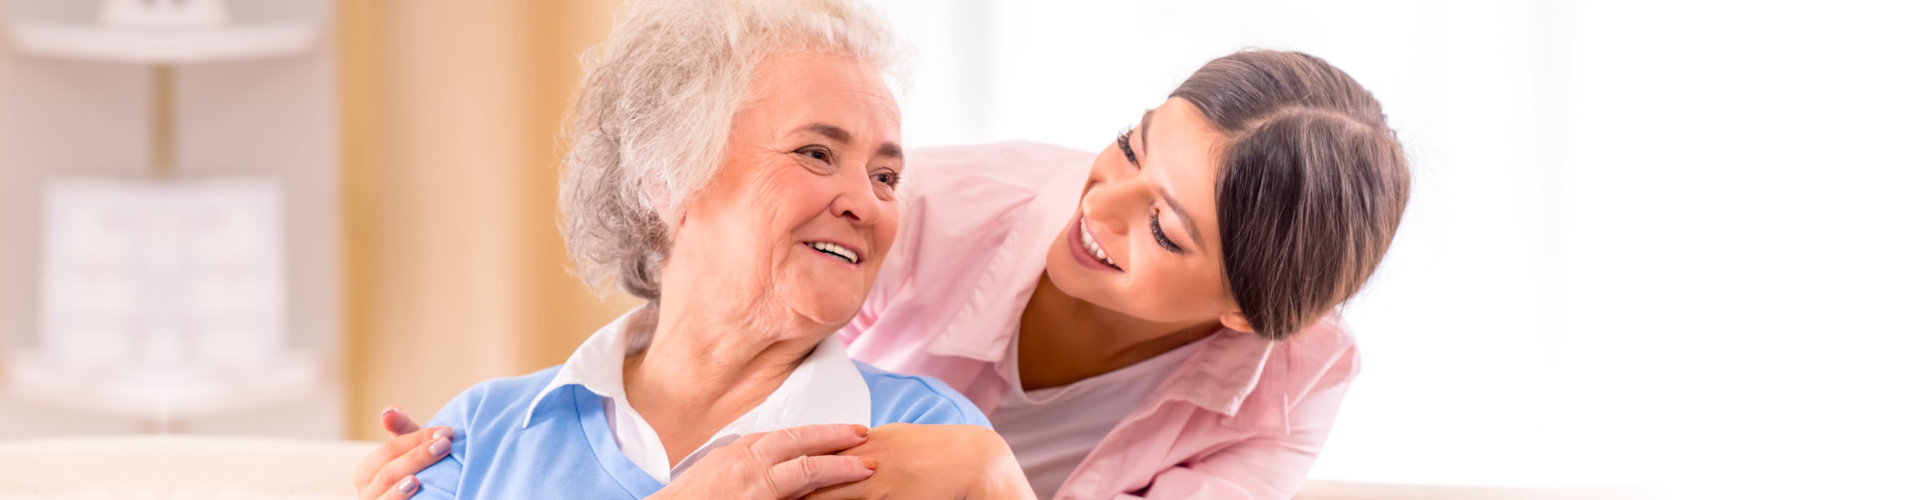 happy senior woman and caregiver